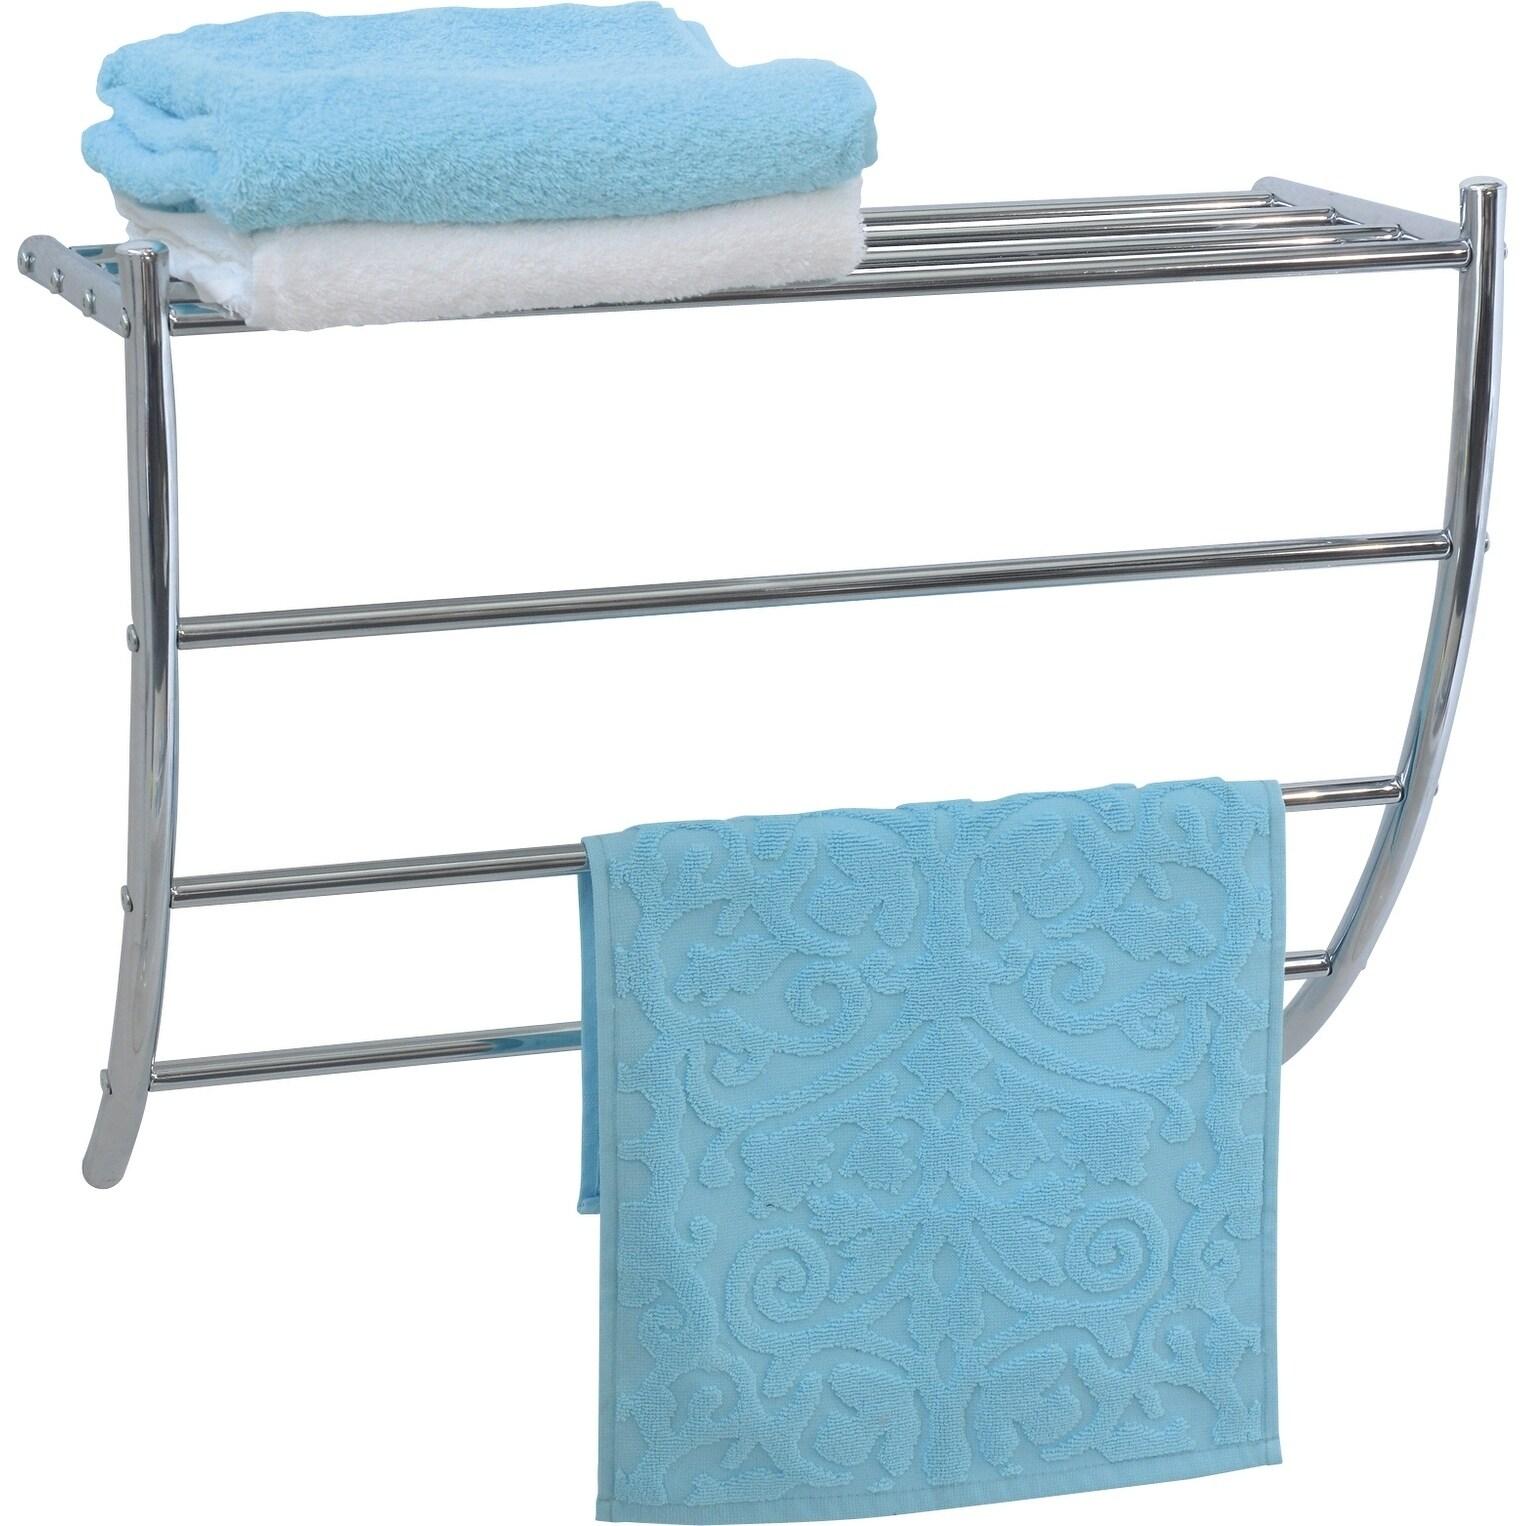 Shop Evideco Wall Mounted Towel Rack Organizer 1 Shelf 3 Bars Metal ...